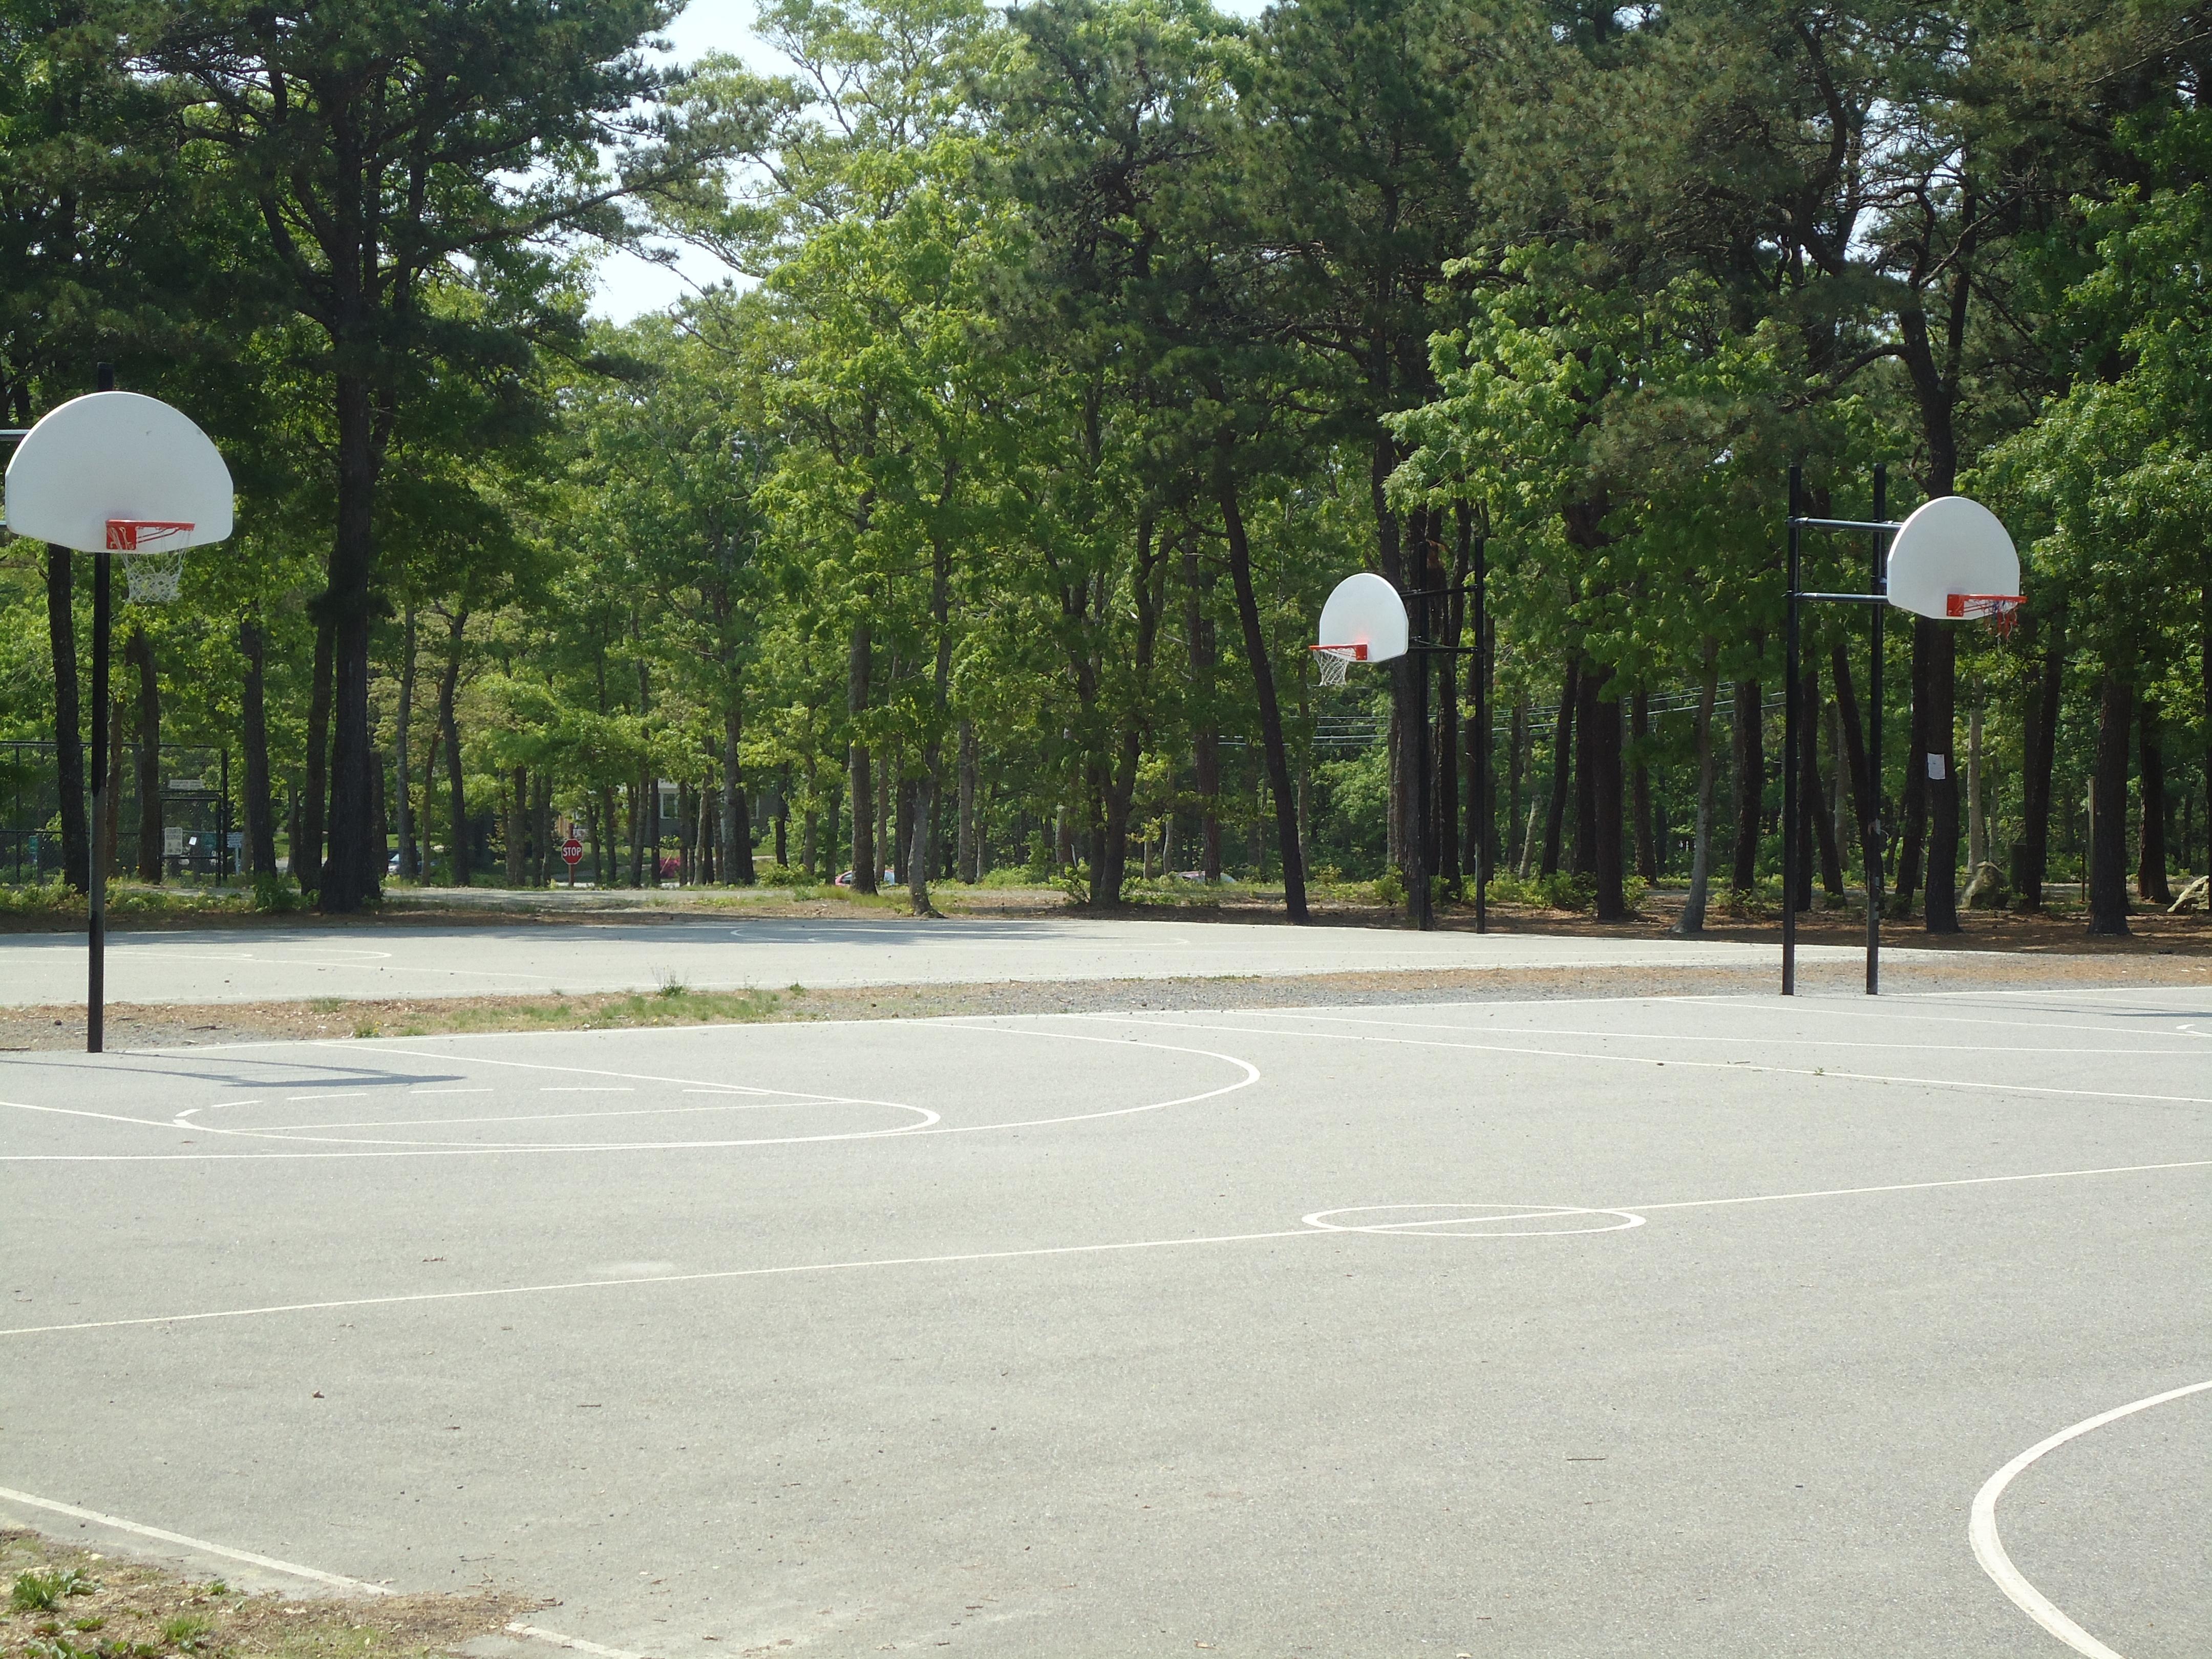 Outdoor Basketball Court, Basket, Court, Hoop, Outdoors, HQ Photo